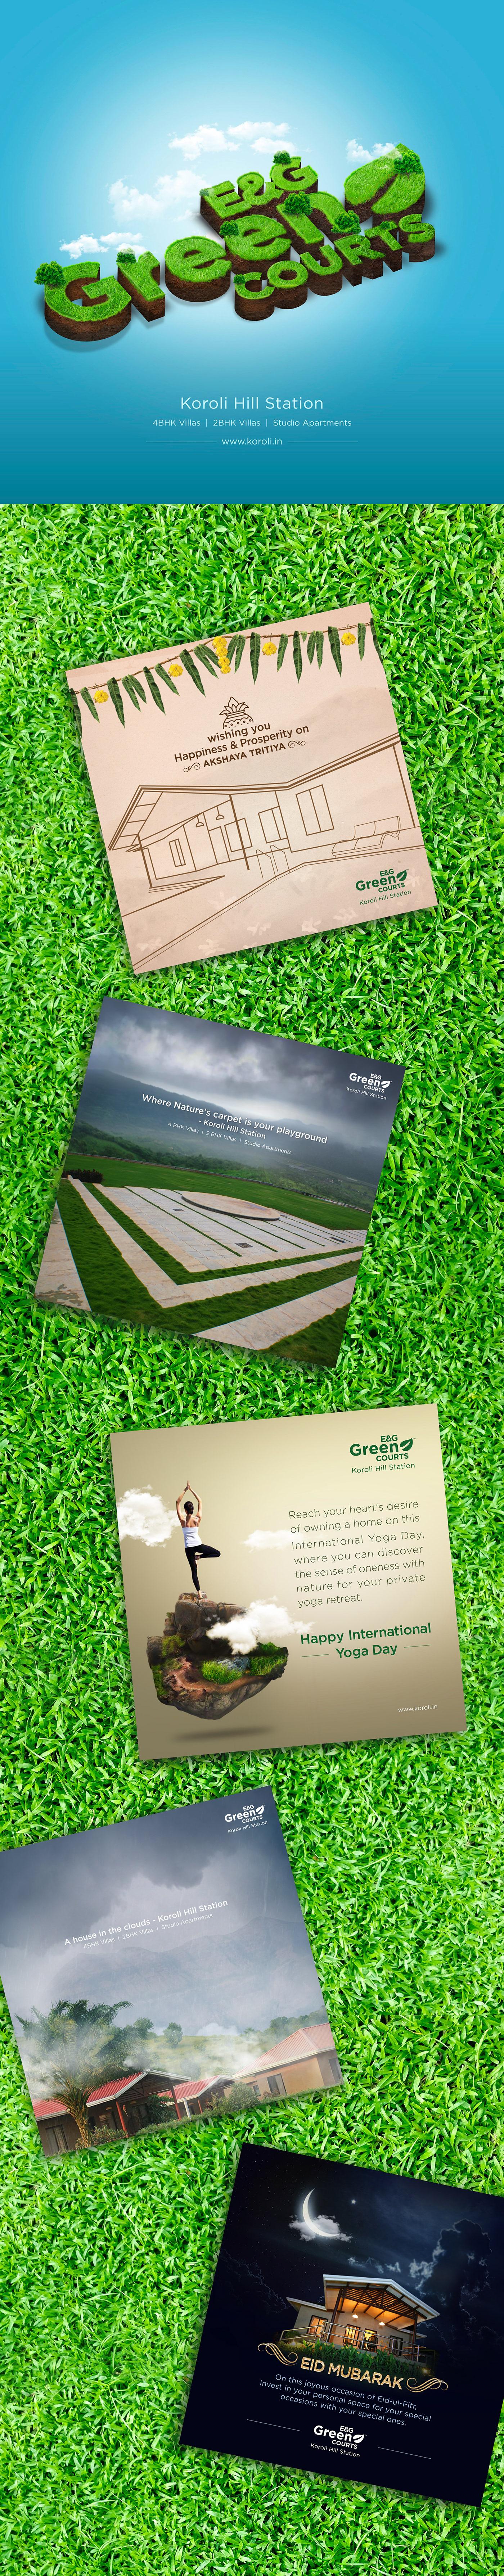 E&G Startupfarms digitalcommunication Hillstation Nature Startup Farms